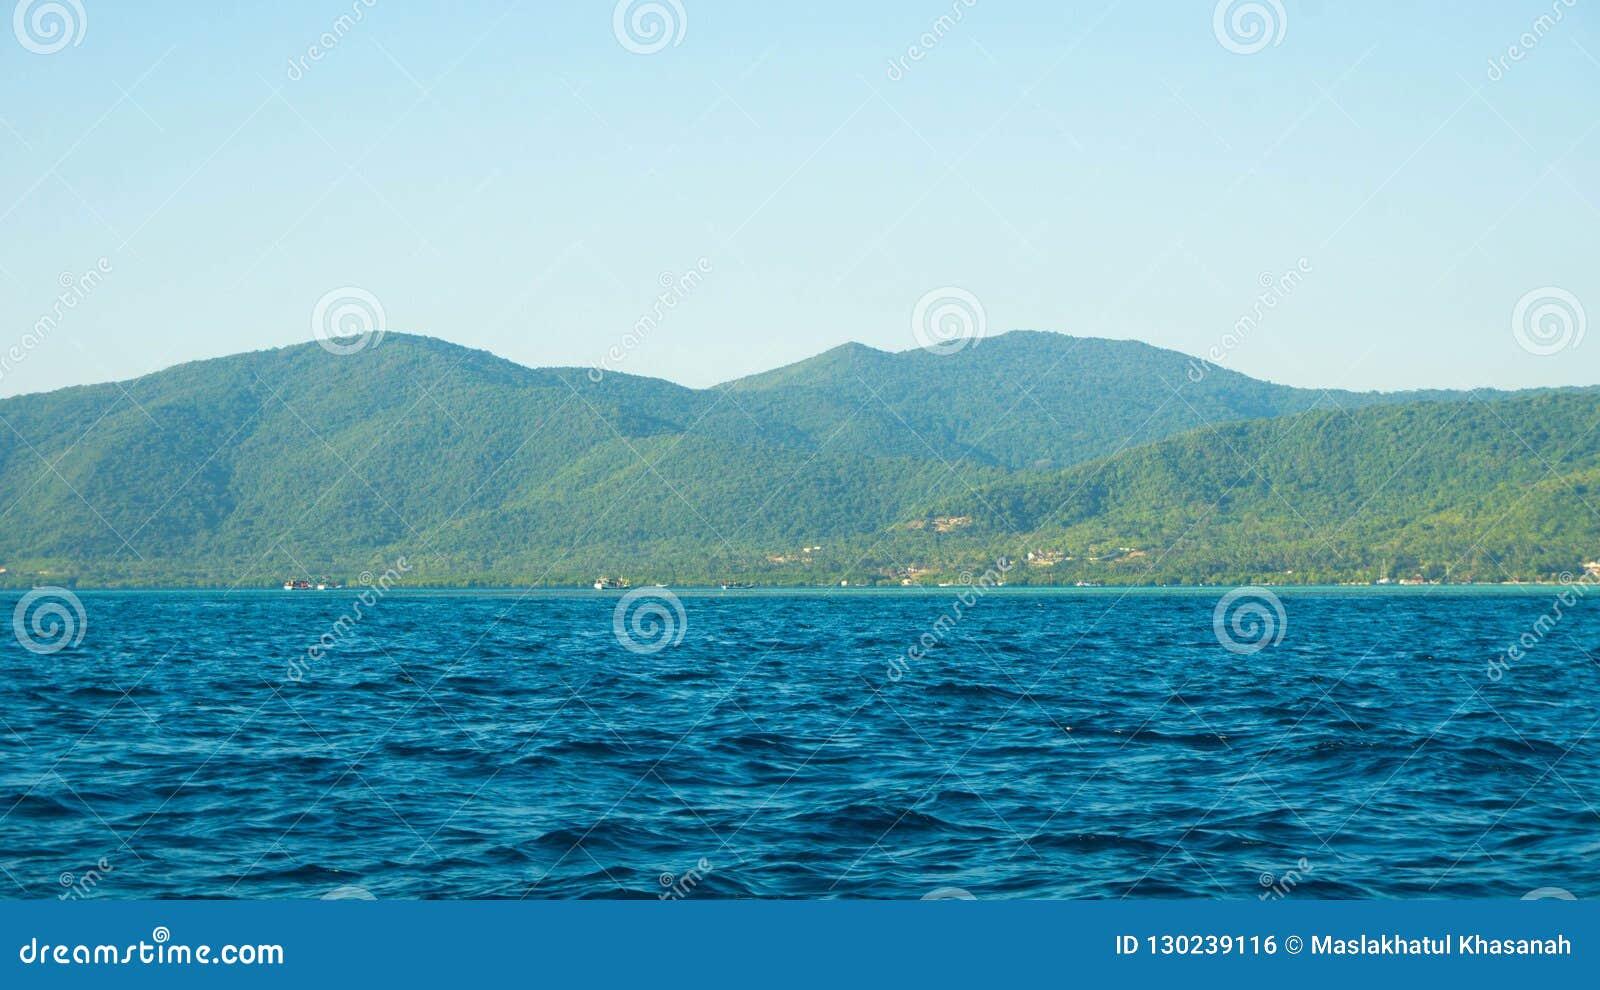 A Big Green Island With Deep Blue Dark Sea In Karimun Jawa Island